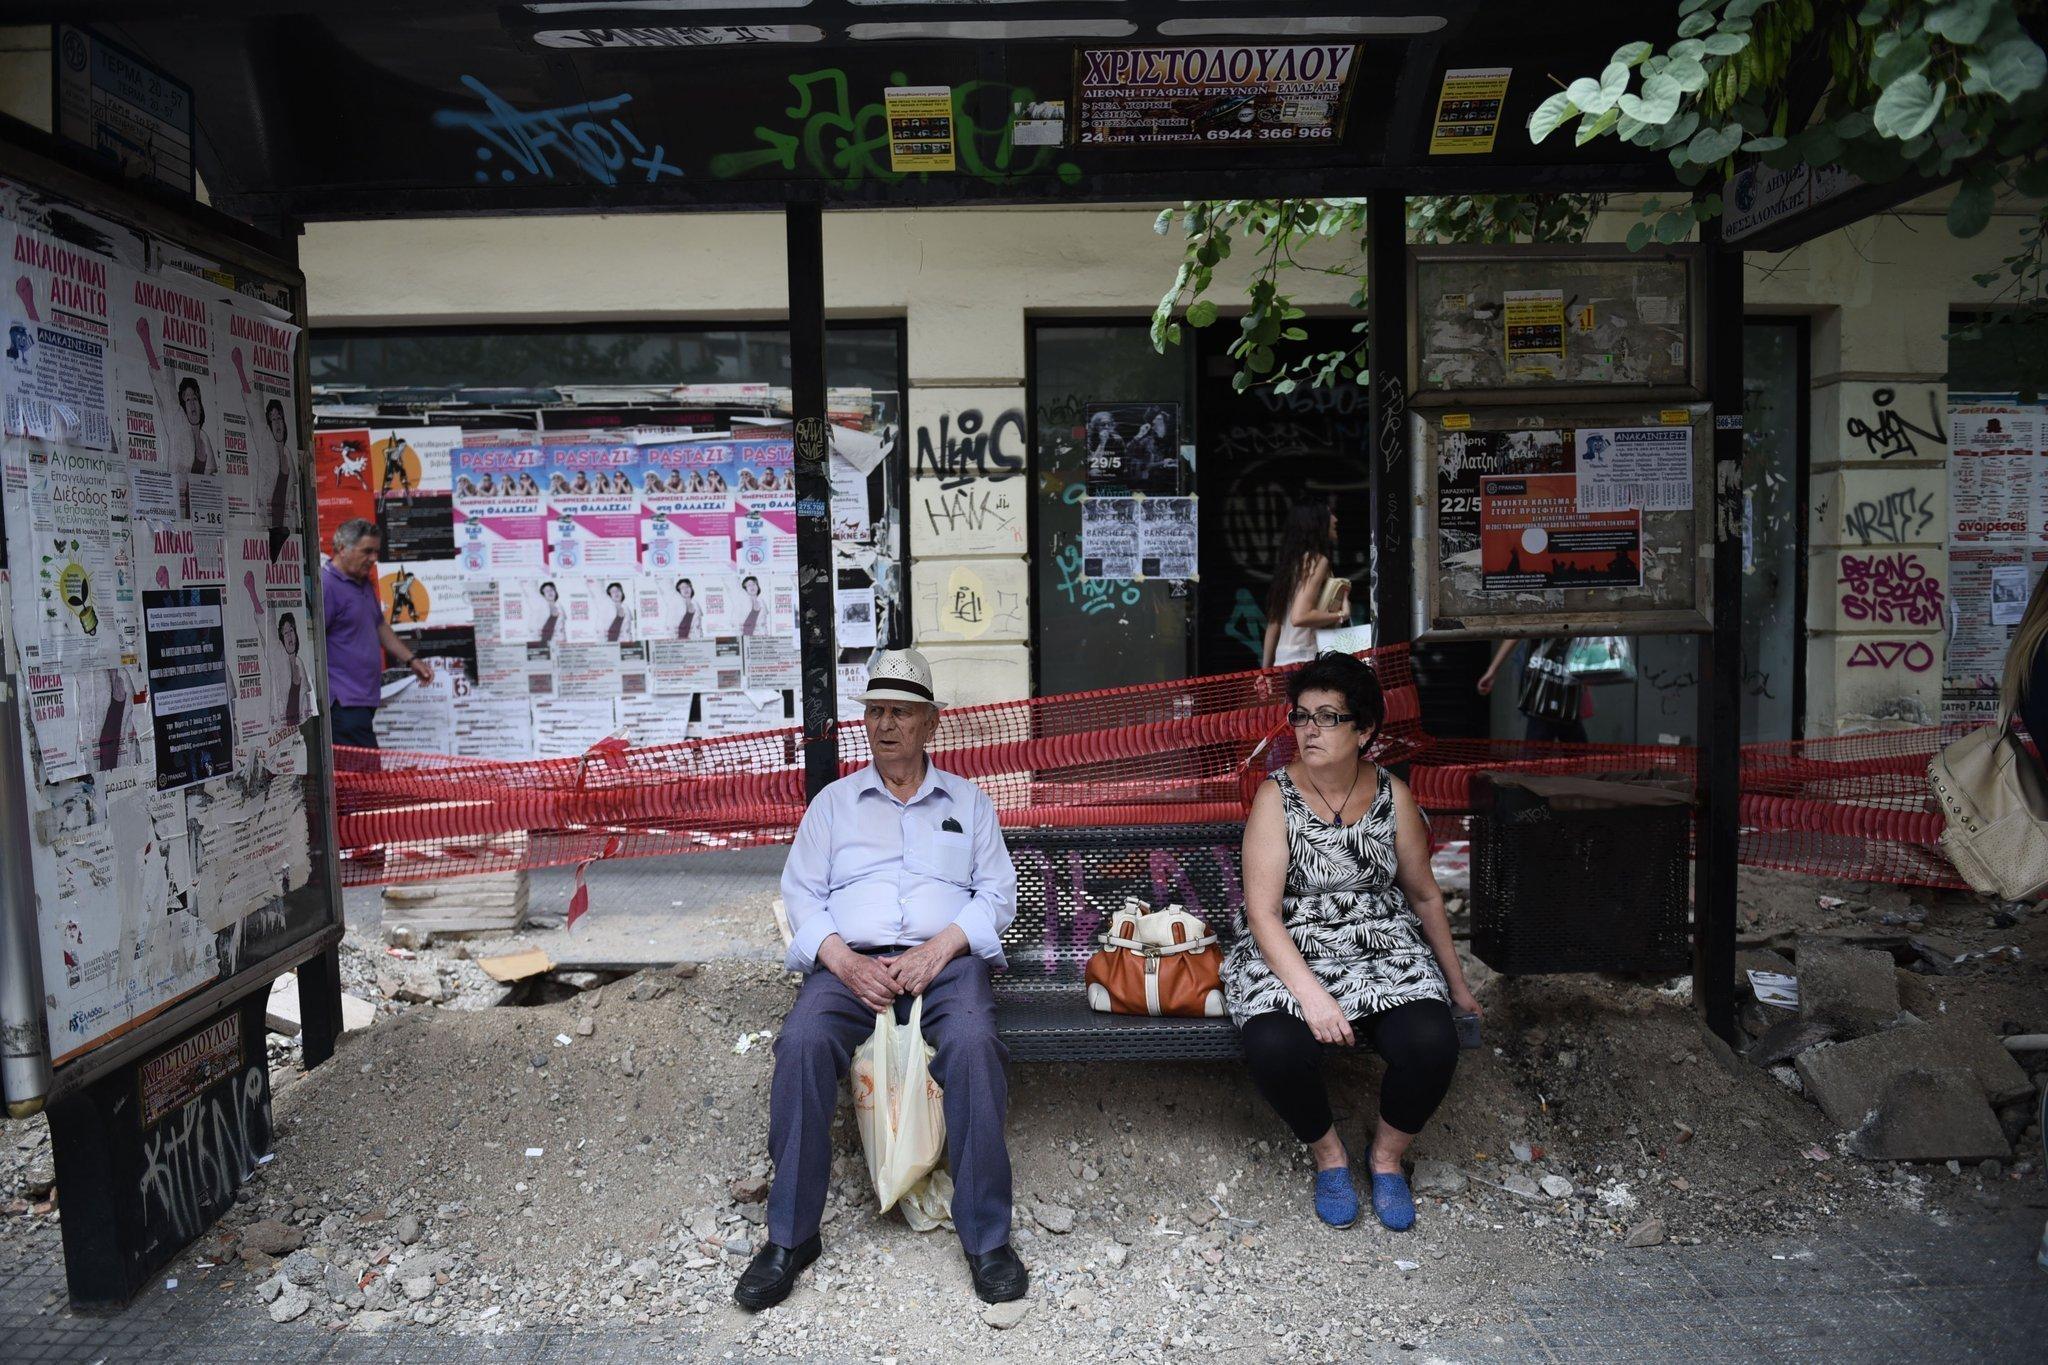 la-fg-greece-debt-crisis-positions-20150701